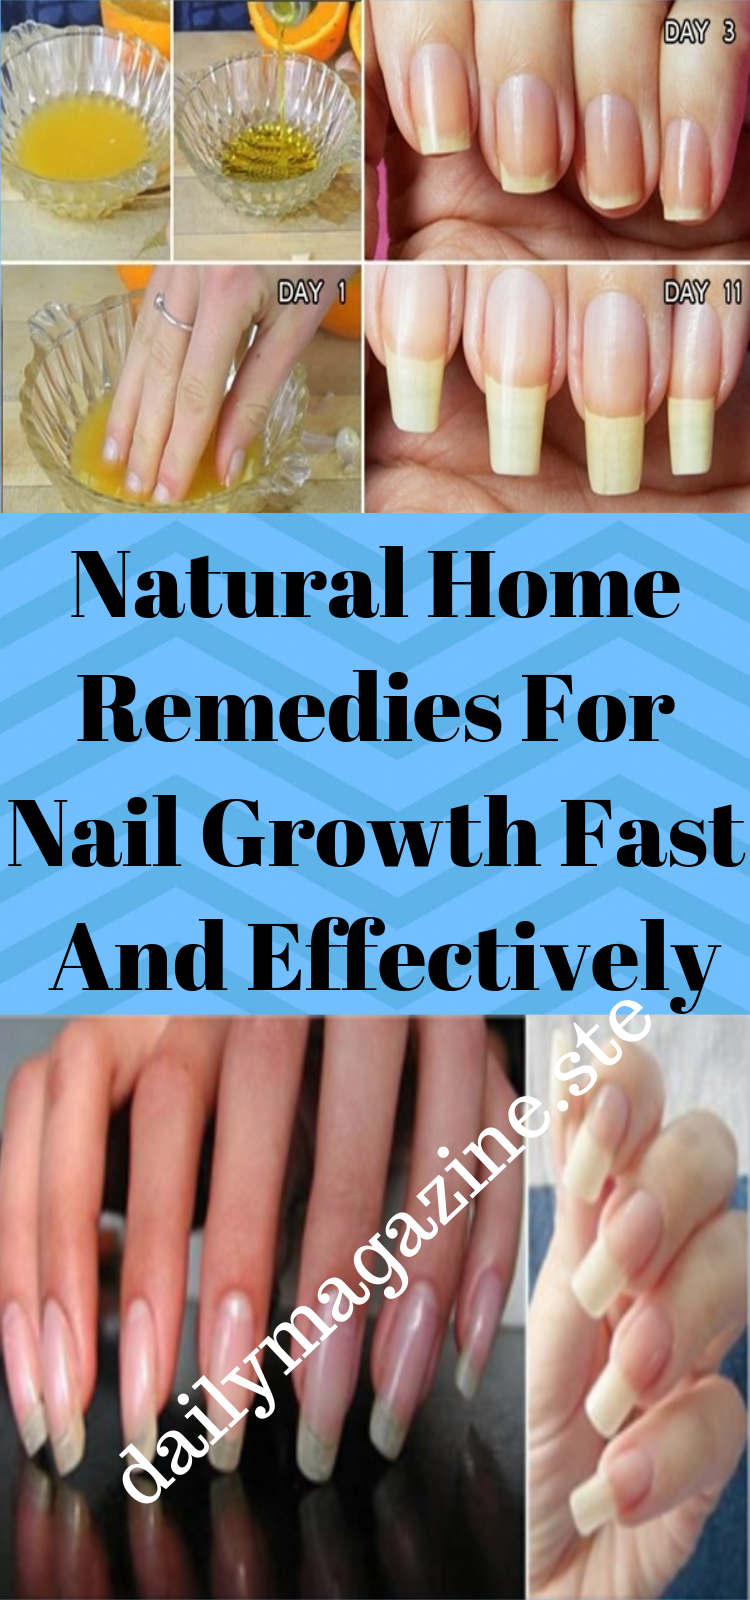 Pin By Diana Venus On Health Nail Growth Remedies Nail Growth Faster Nail Growth Tips